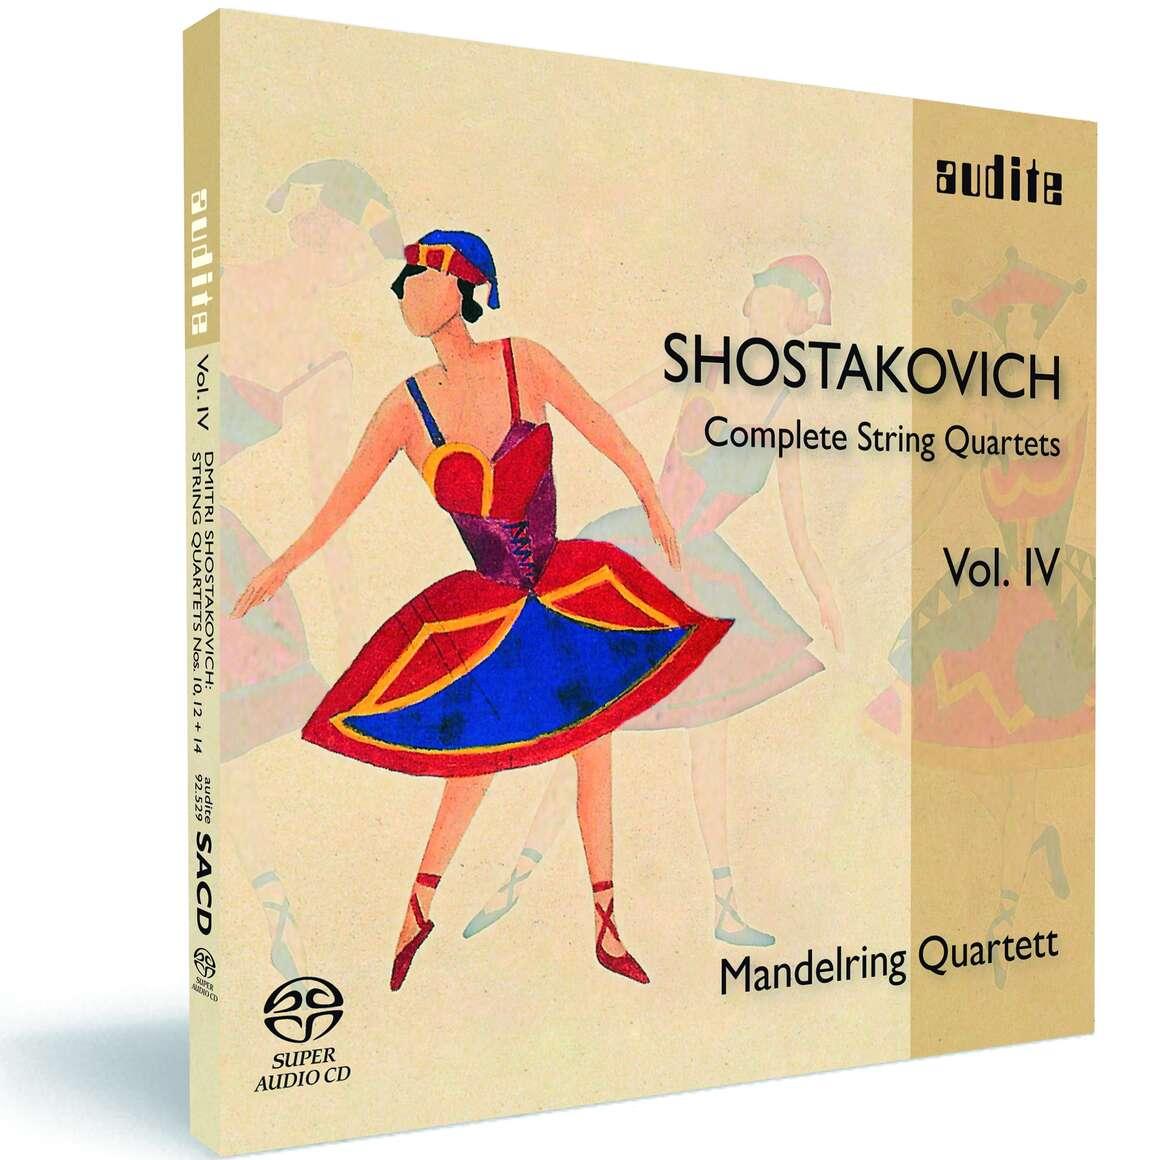 D. Shostakovich: Complete String Quartets Vol. IV